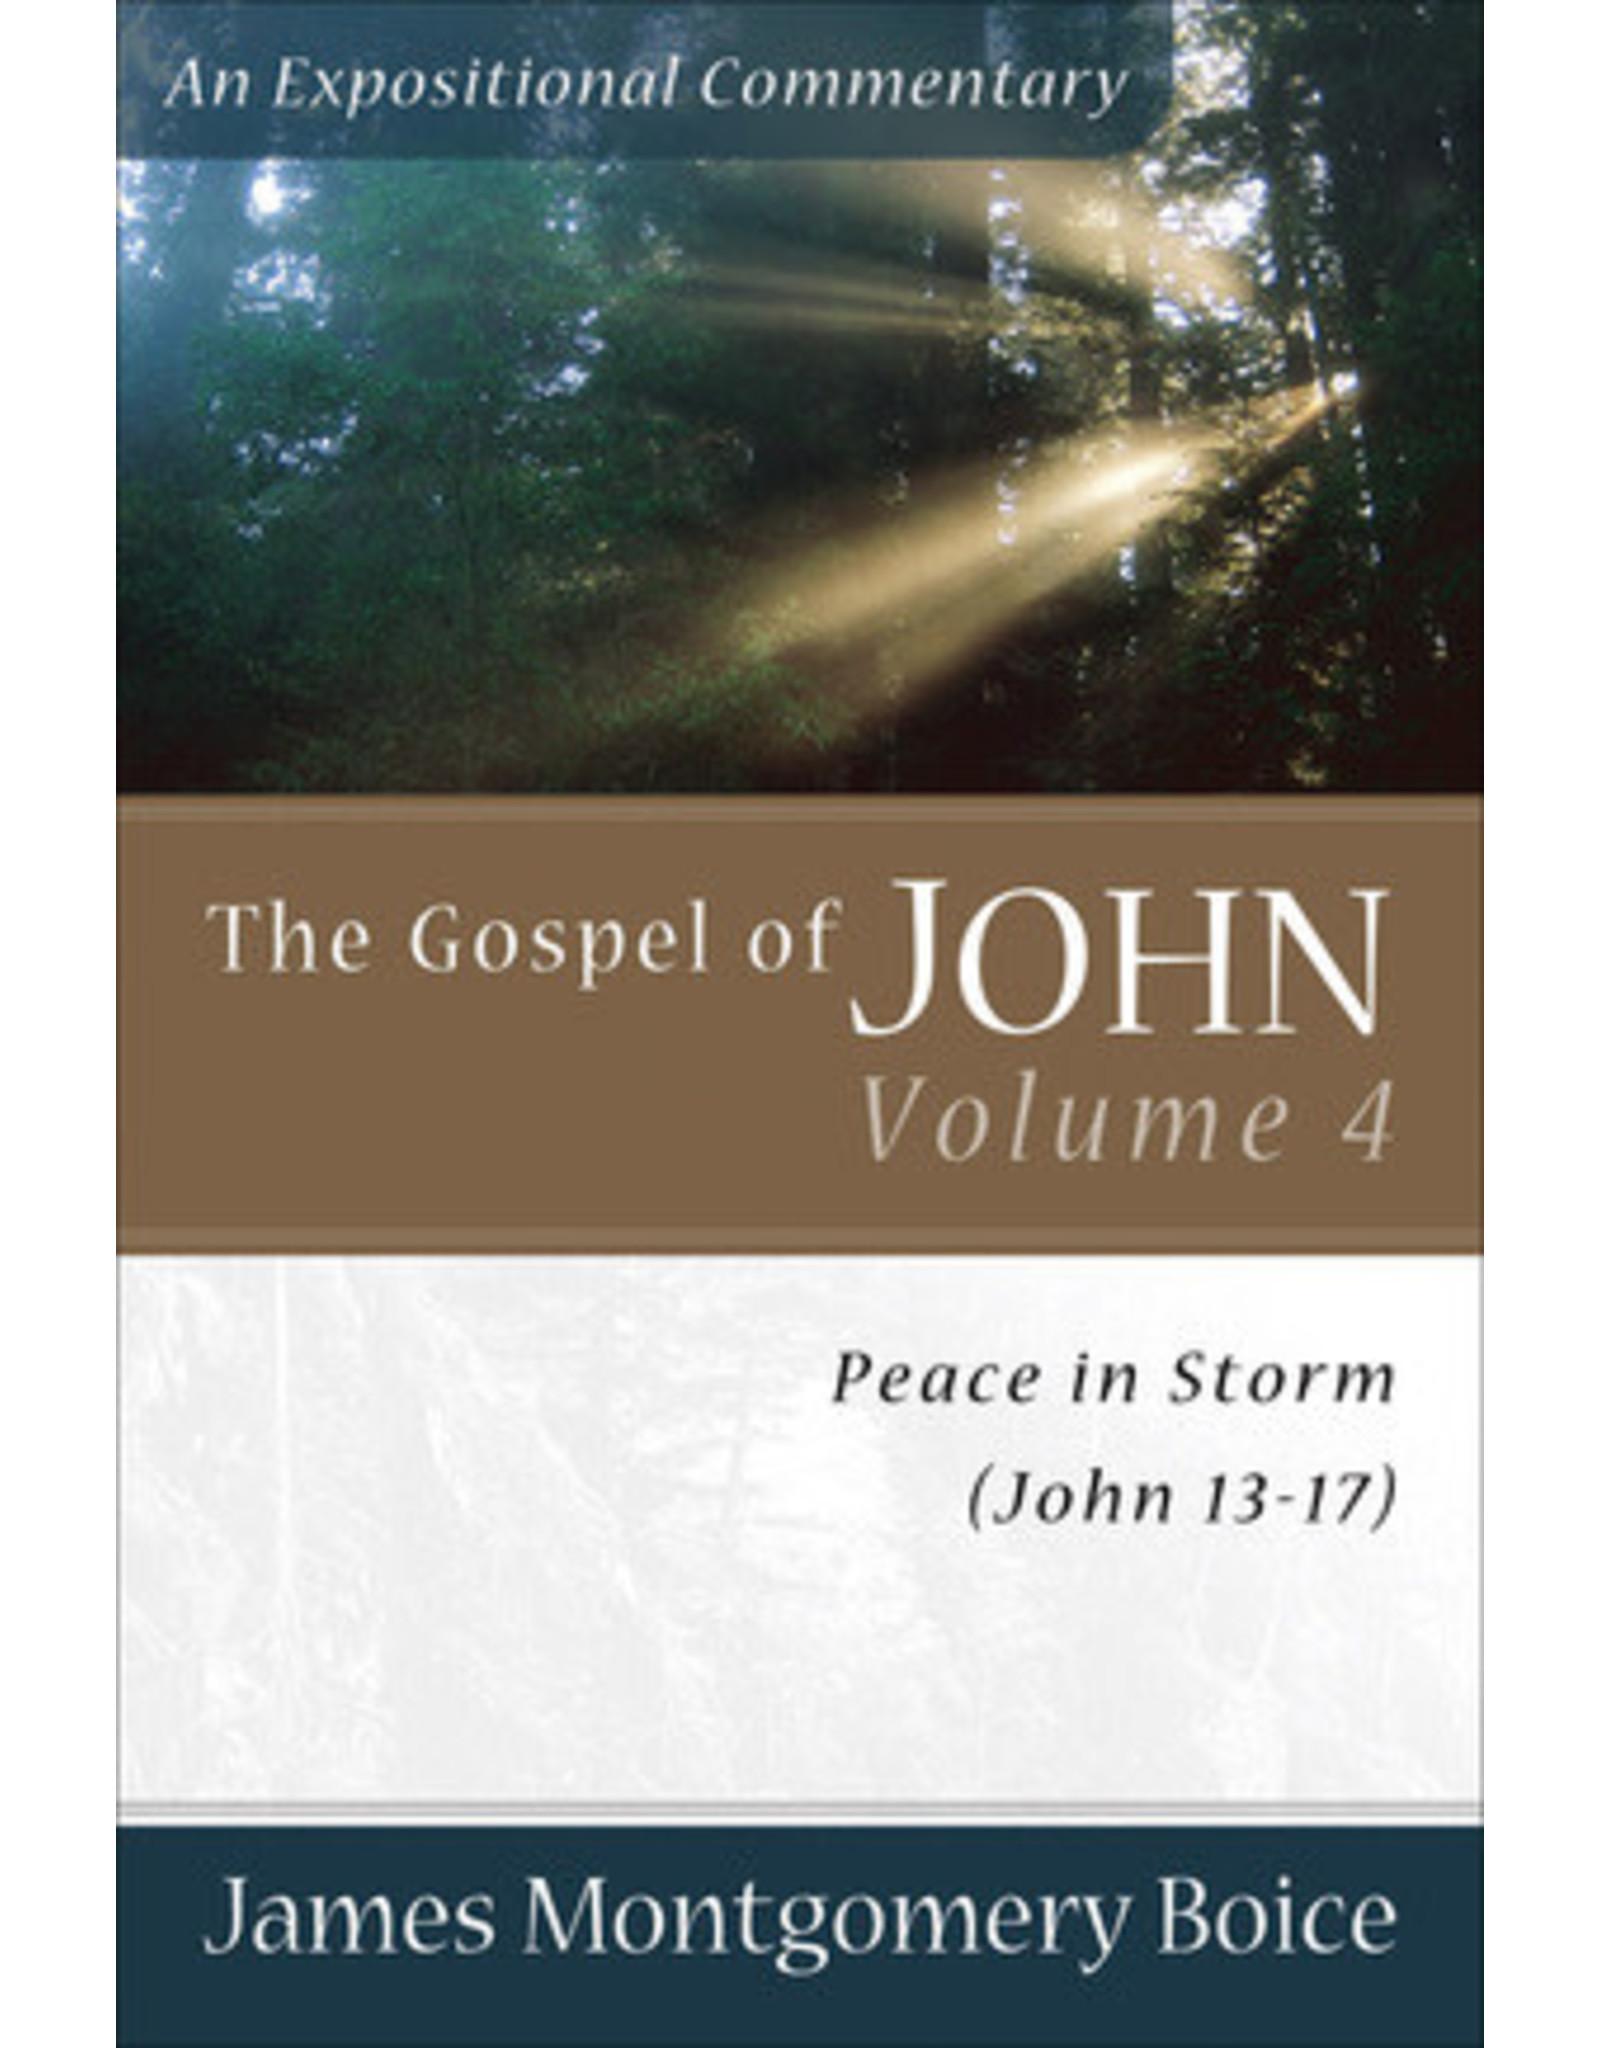 Boice The Gospel of John 13-17: Vol 4; An Expositional Commentary